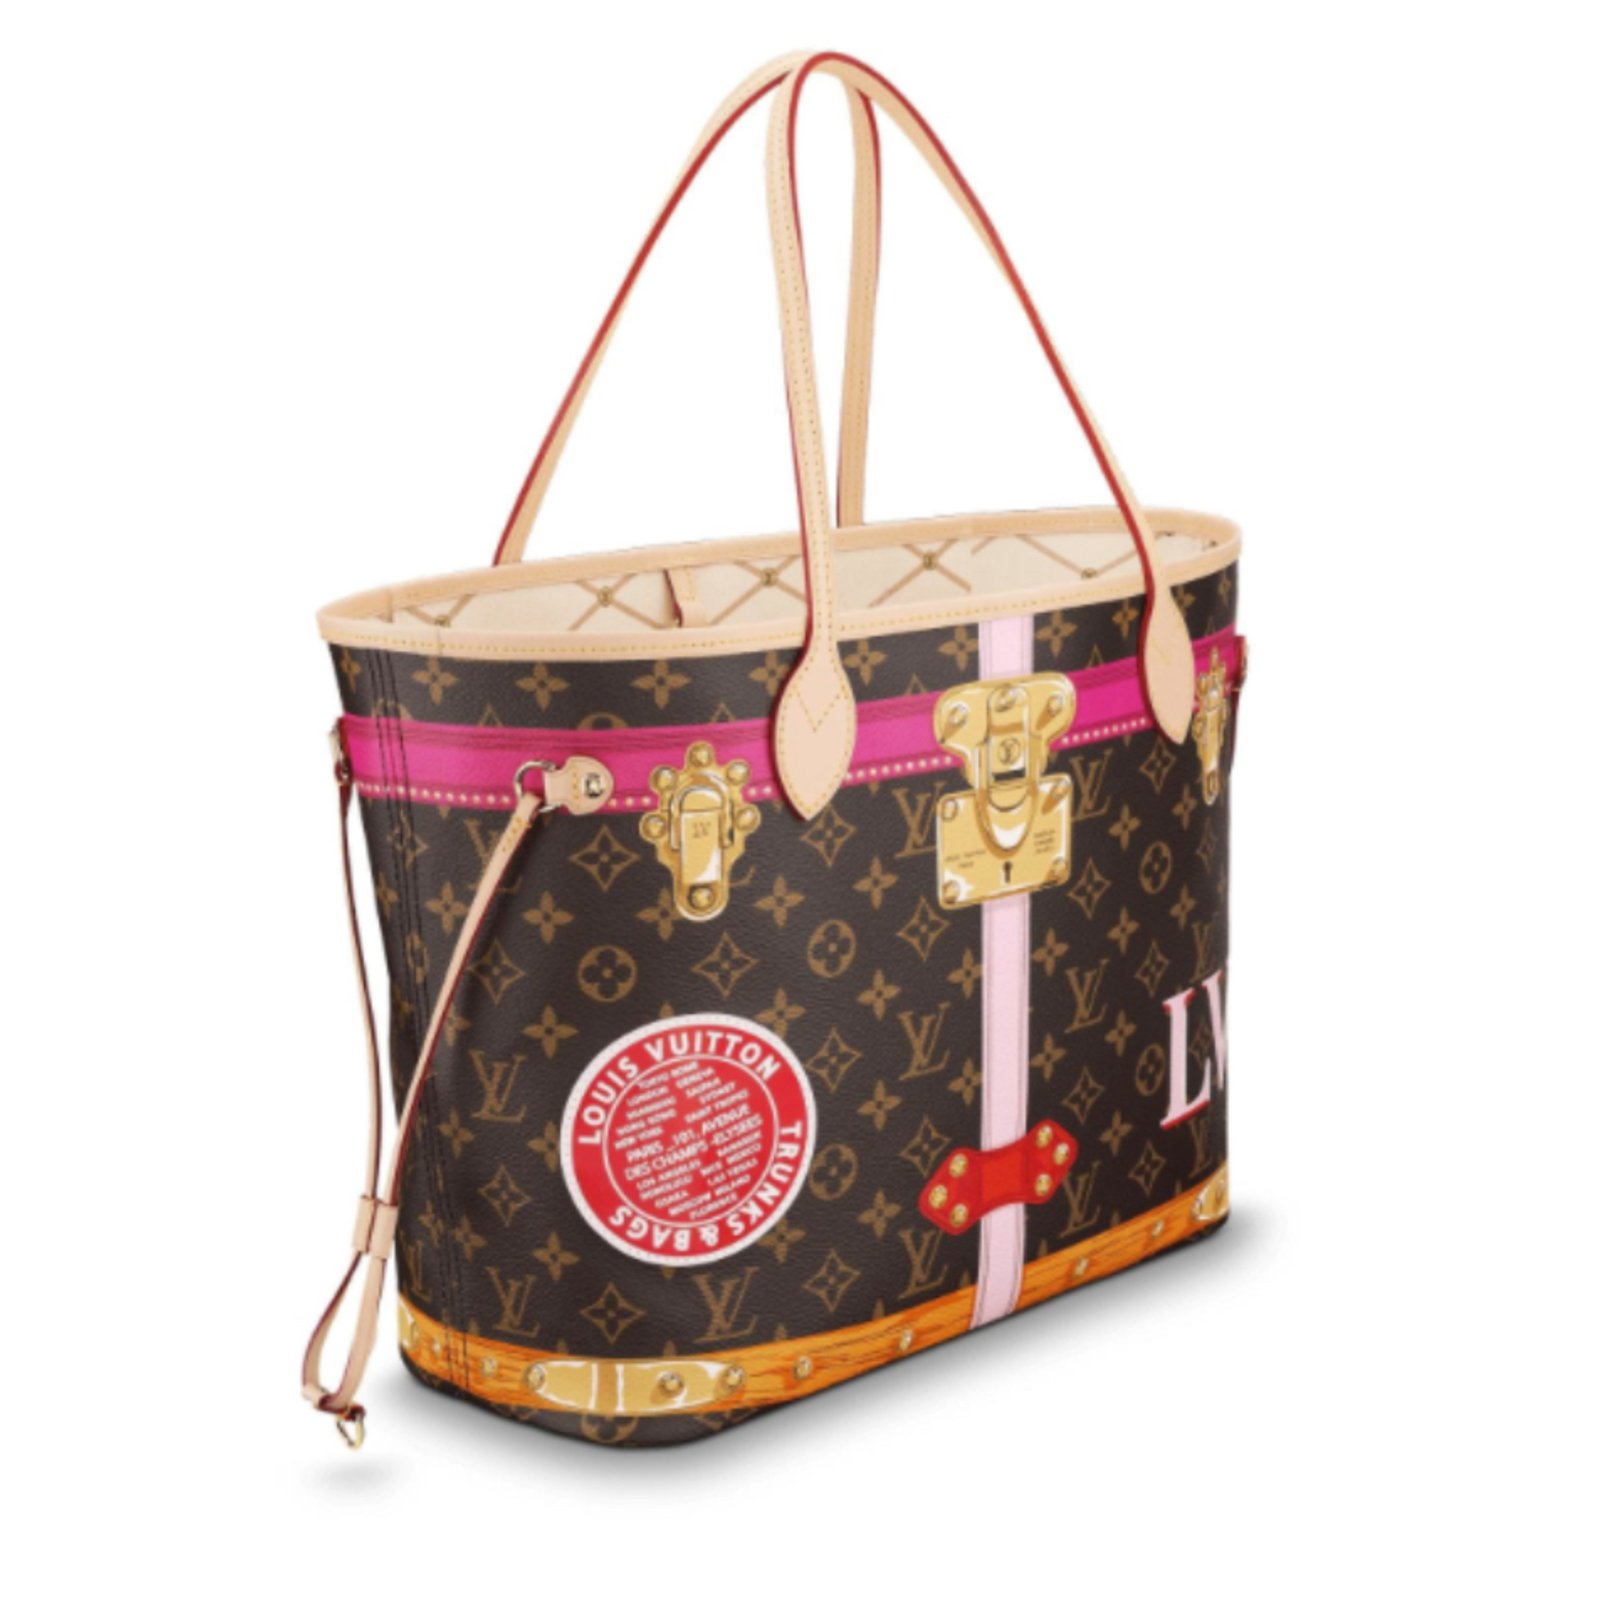 Sacs à main Louis Vuitton Neverfull Cuir,Toile Autre ref.75922 ... a02b06a5214